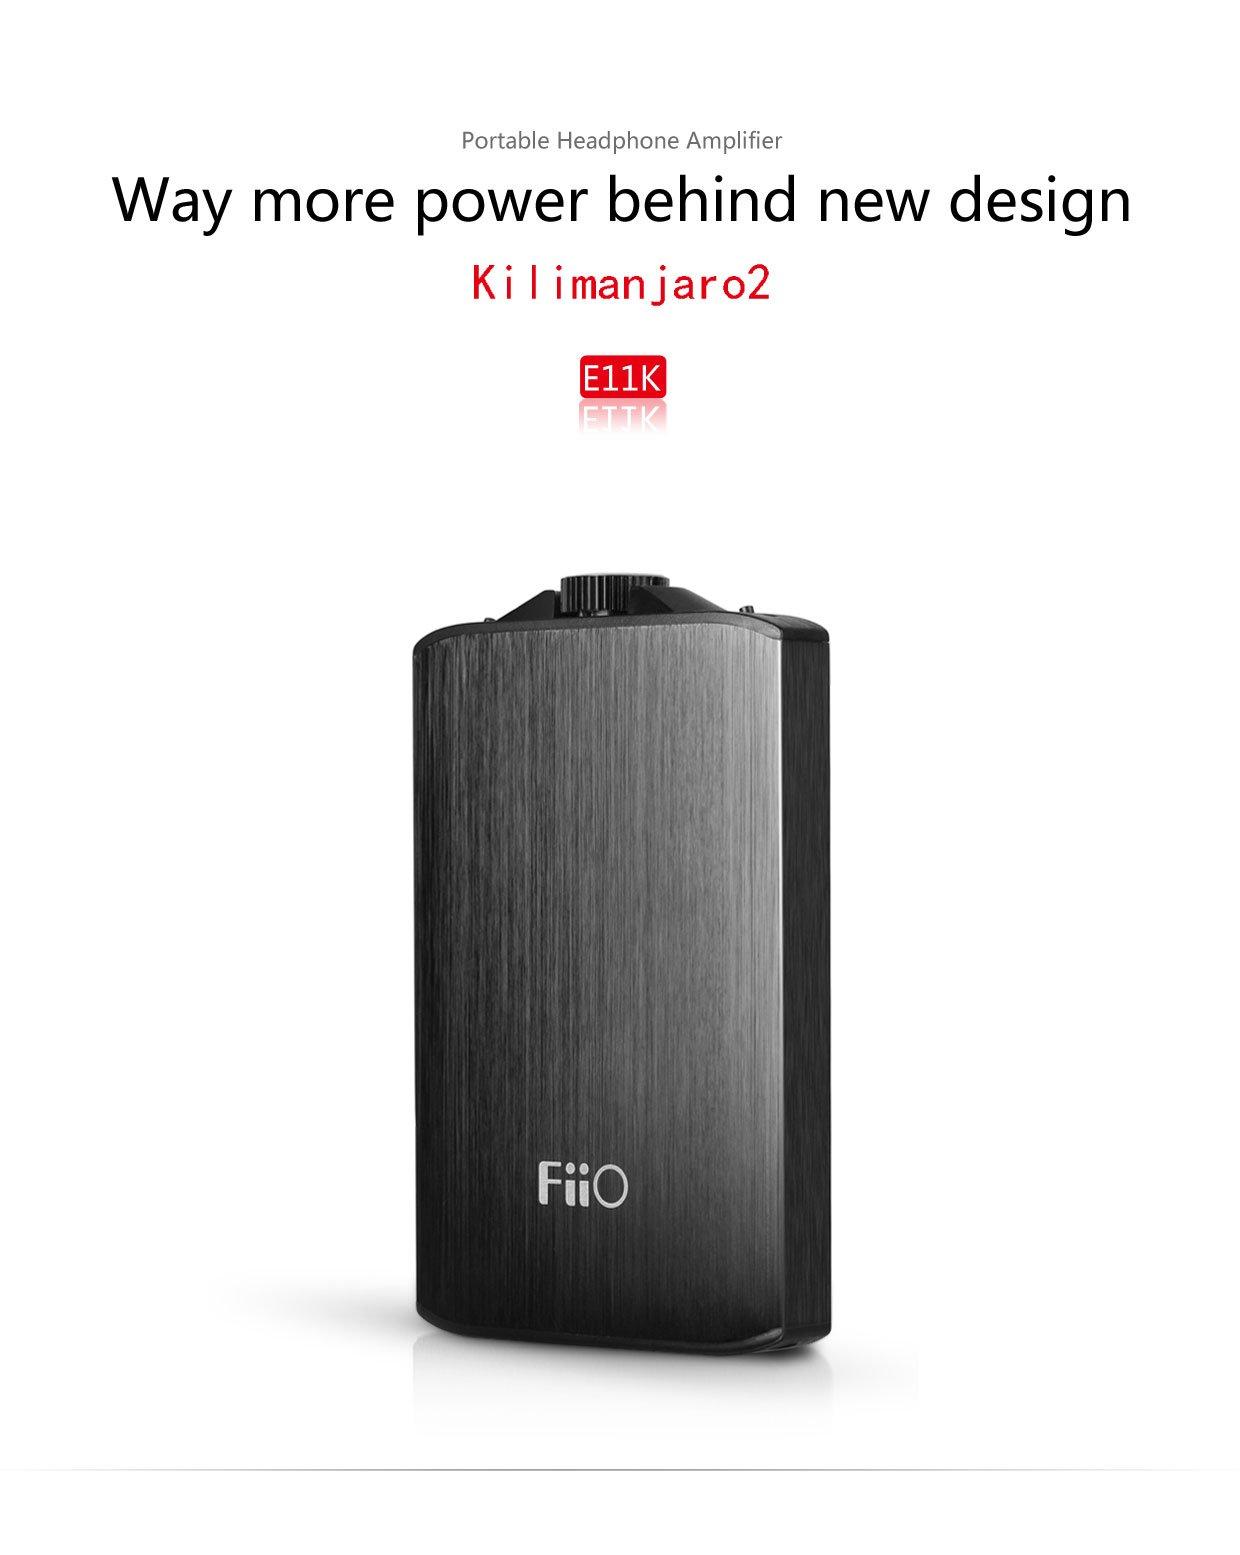 FiiO A3 (E11K E11) Kilimanjaro 2 Portable Headphone Amplifier with Extreme Audio 3.5mm Stereo to RCA Cable by FiiO (Image #2)